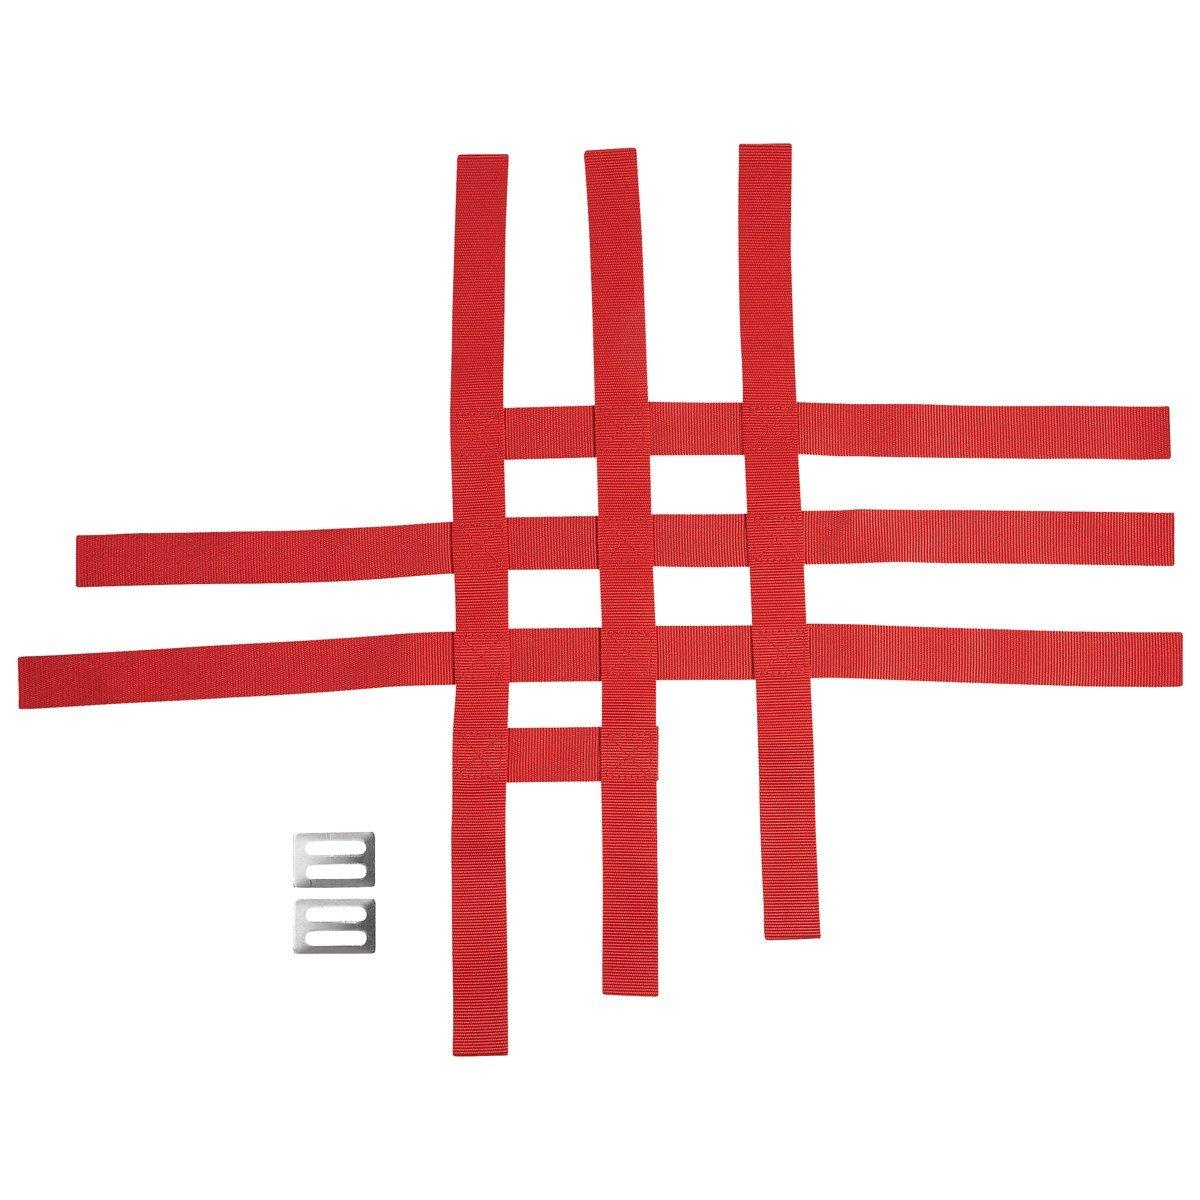 YAMAHA YFZ450X & YFZ450R RED REPLACEMENT NERF BAR WEBBING NETS 18PF11E4T000